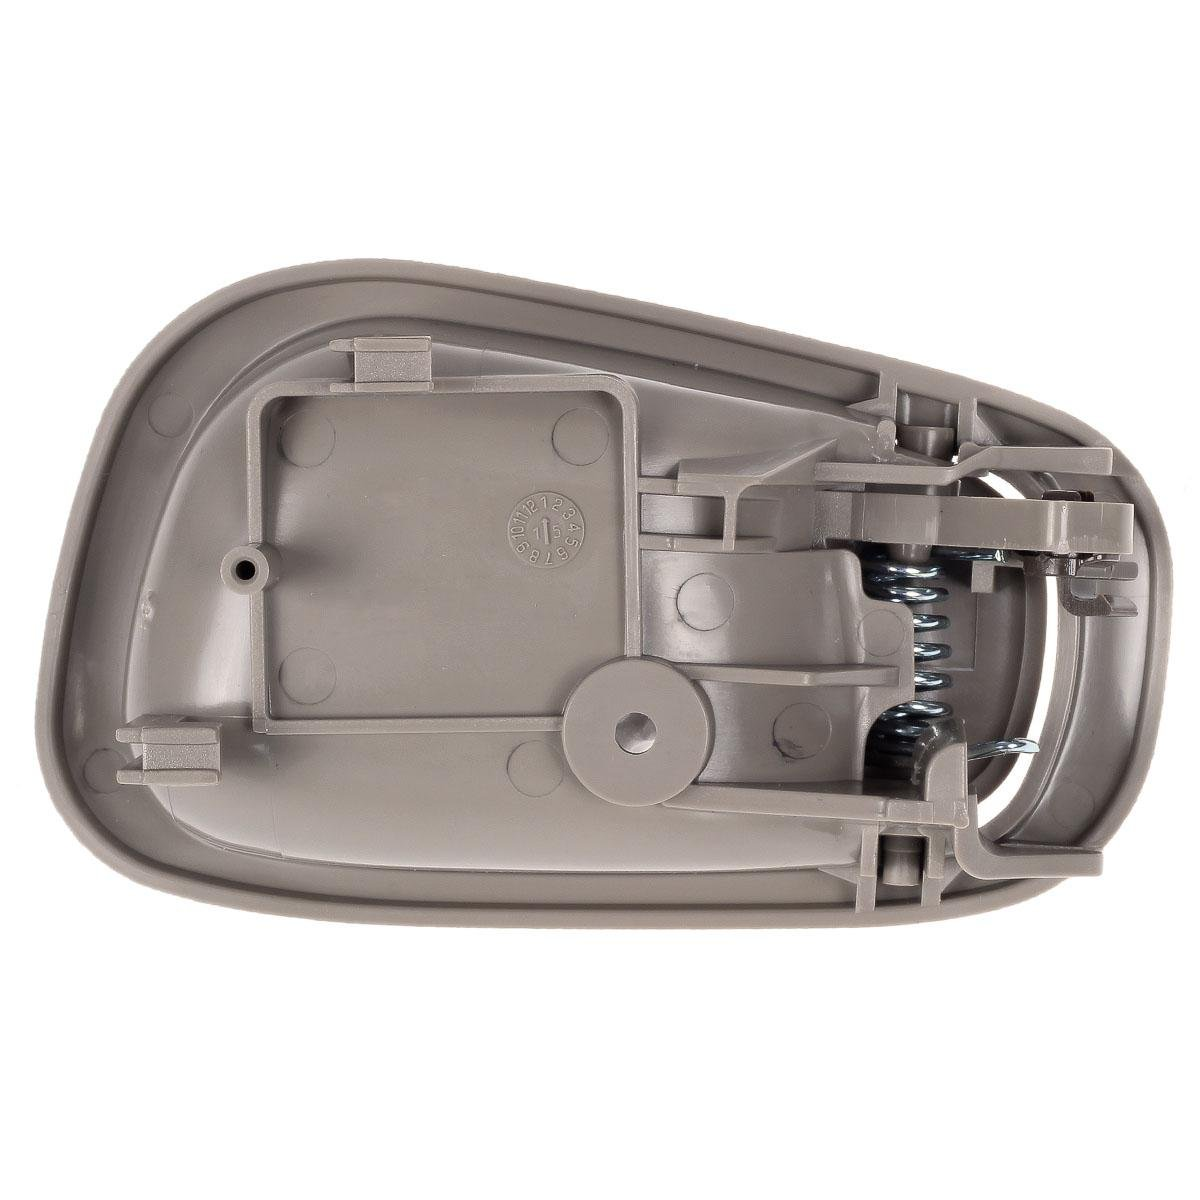 AUTEX 8pcs Exterior Interior Door Handles Front Rear Right Left Driver Passenger Side Door Handle Set Compatible with Toyota Corolla,Chevrolet Prizm 1998 1999 2000 2001 2002 80889 79501